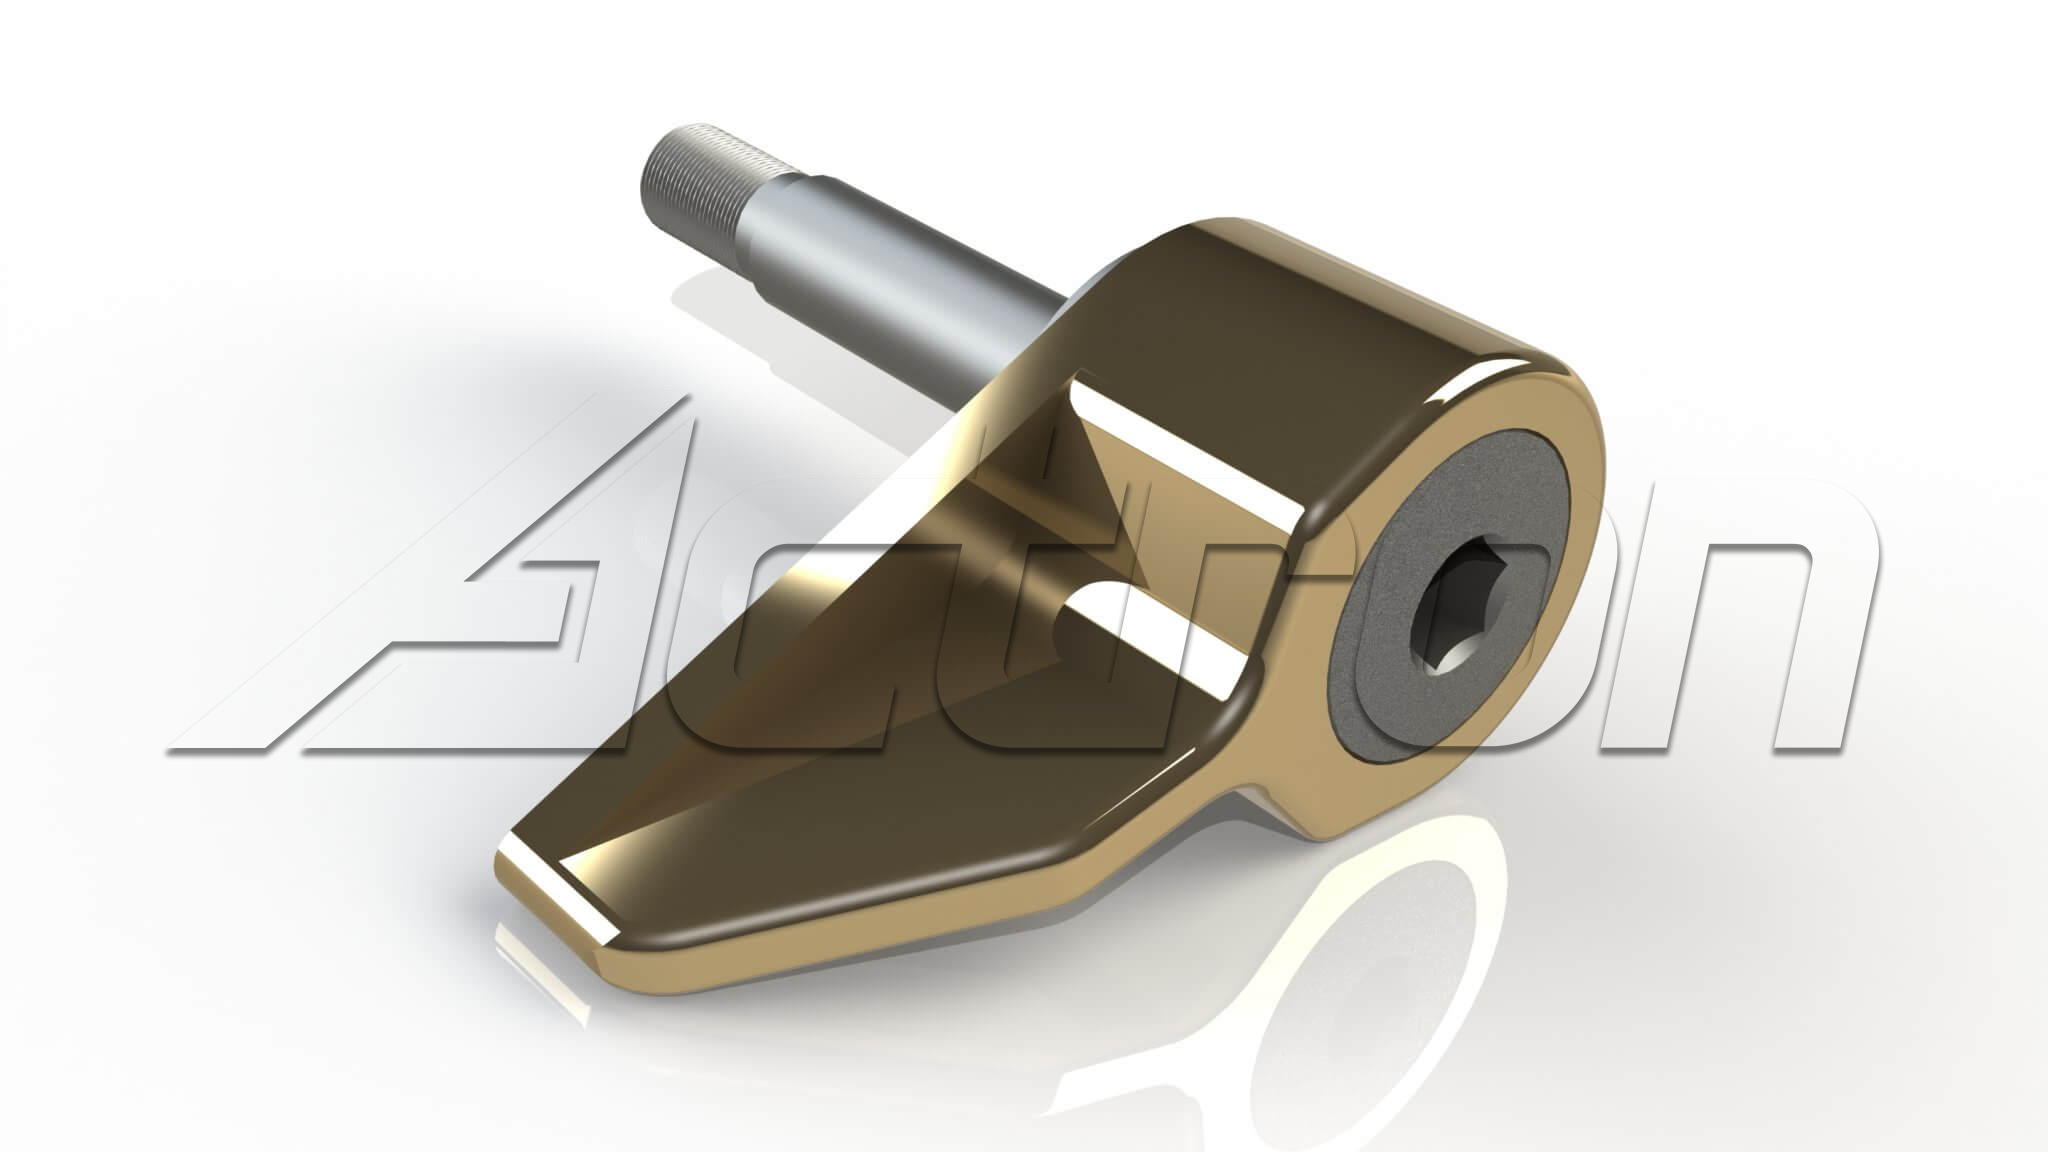 1-4-turn-retainer-4620-a35685.jpg